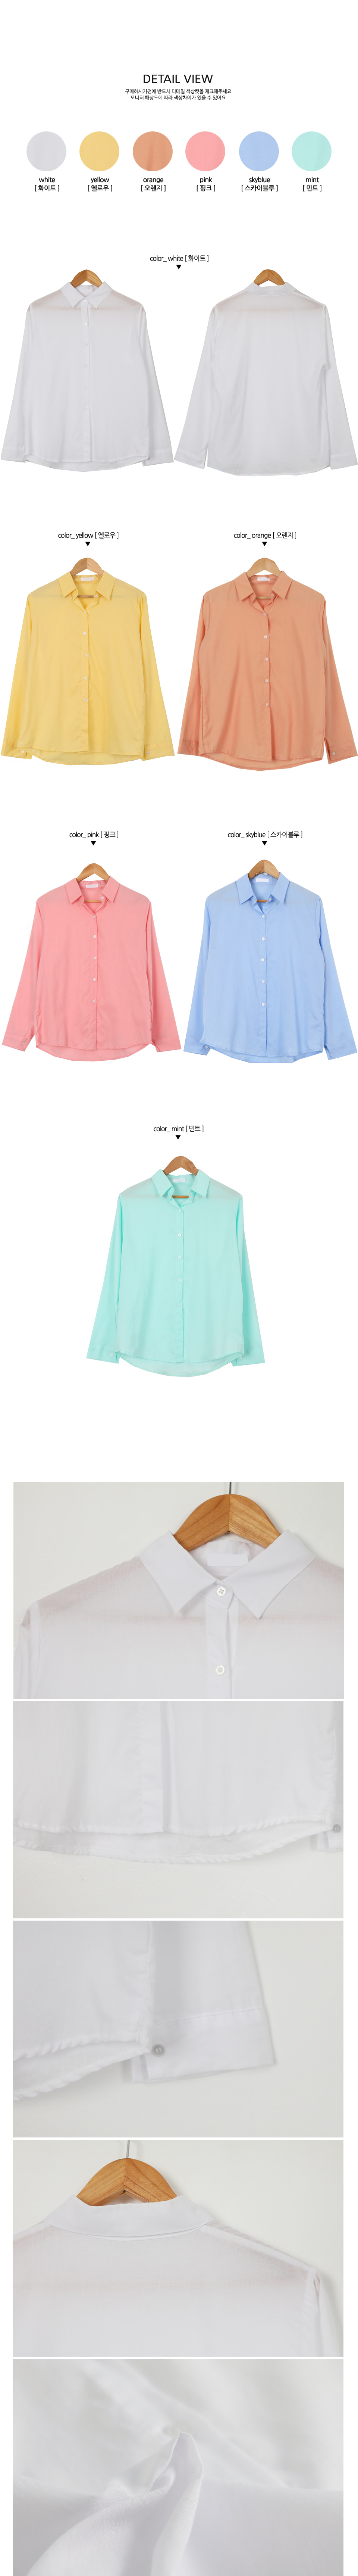 Lovin Summer Shirt